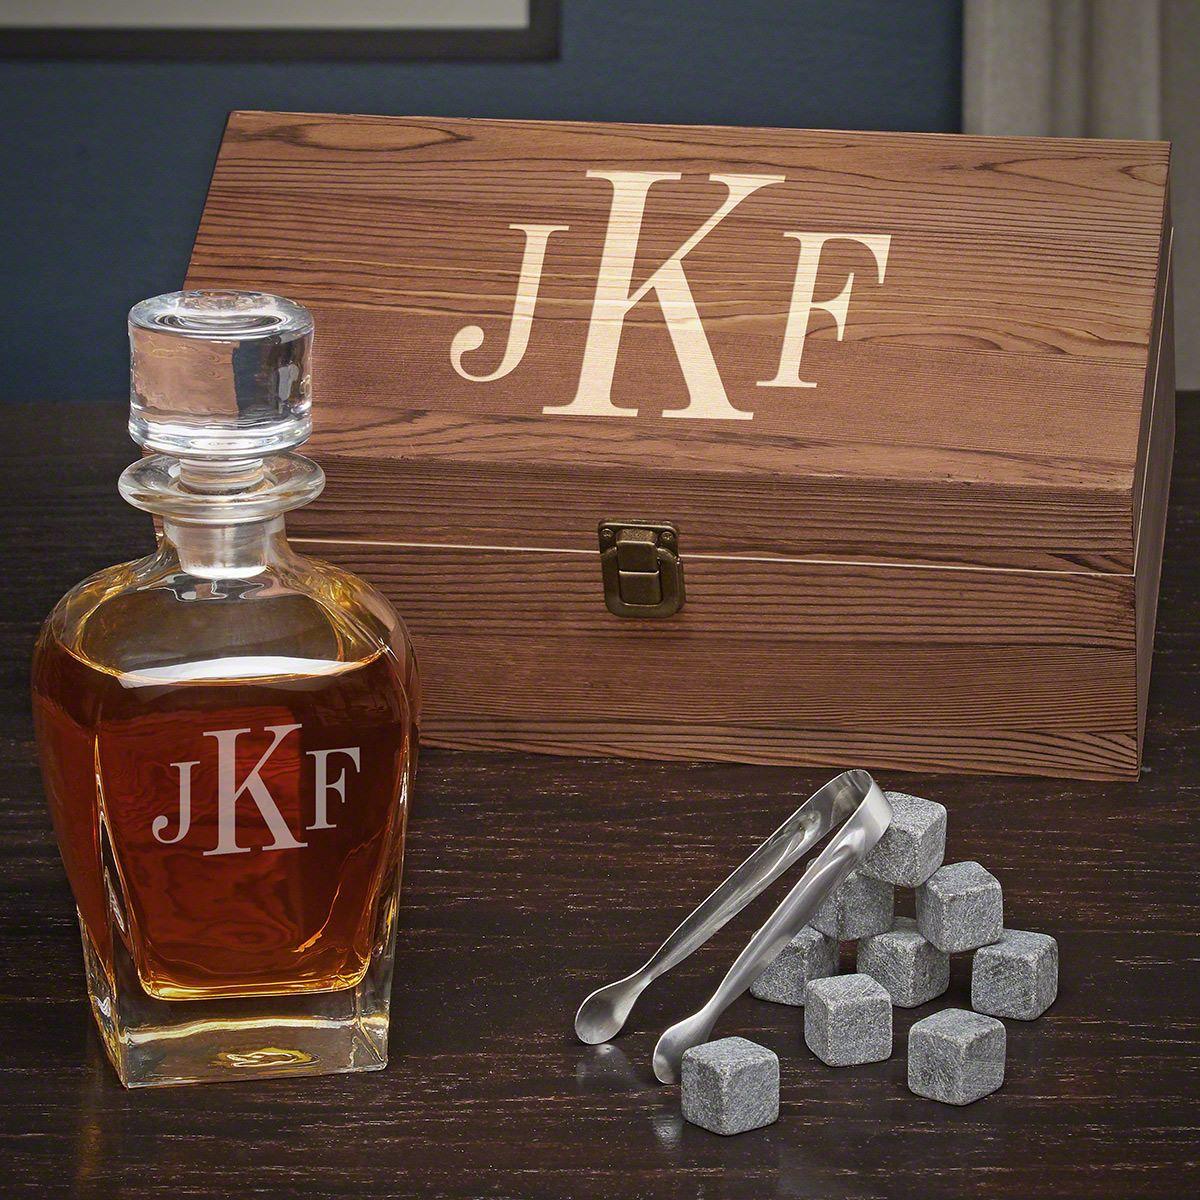 Classic Monogram Personalized Whiskey Decanter Set